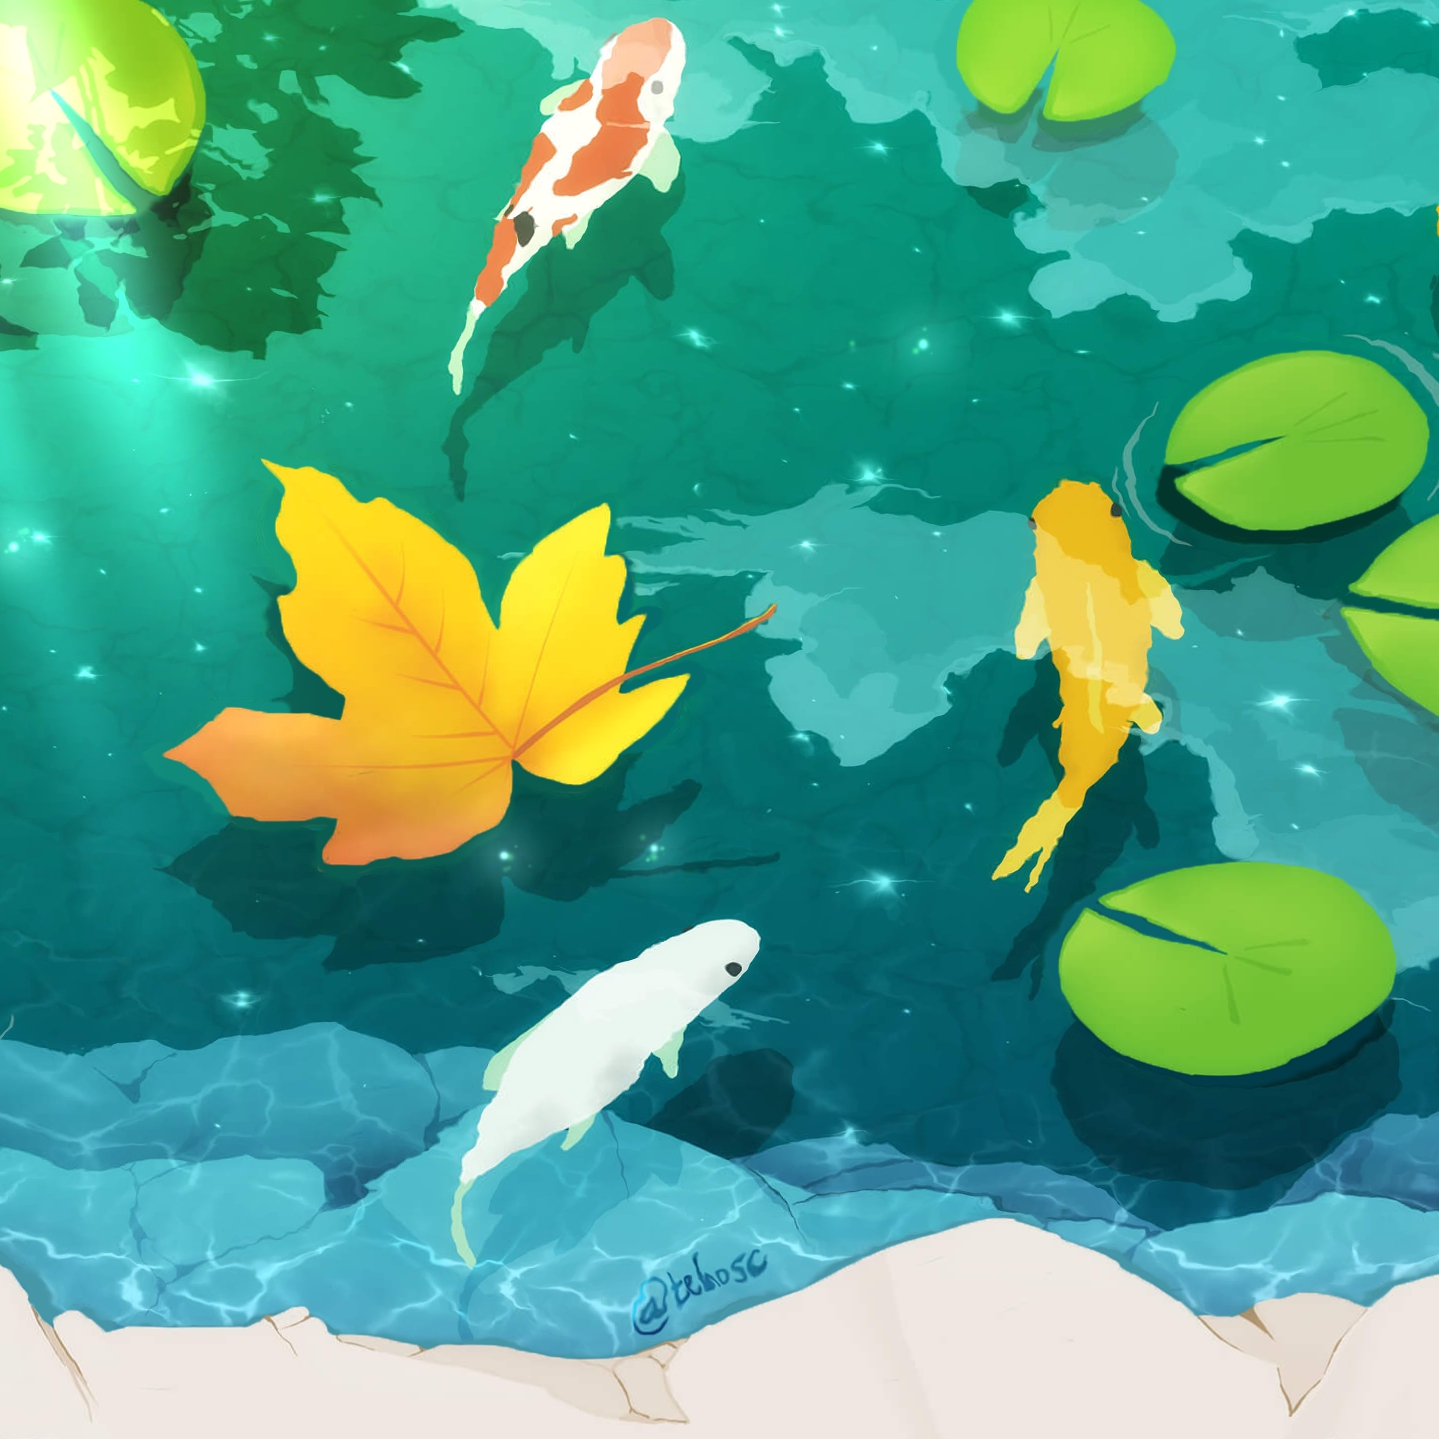 Wallpaper Engine - Koi Pond under Moonlight (2K)